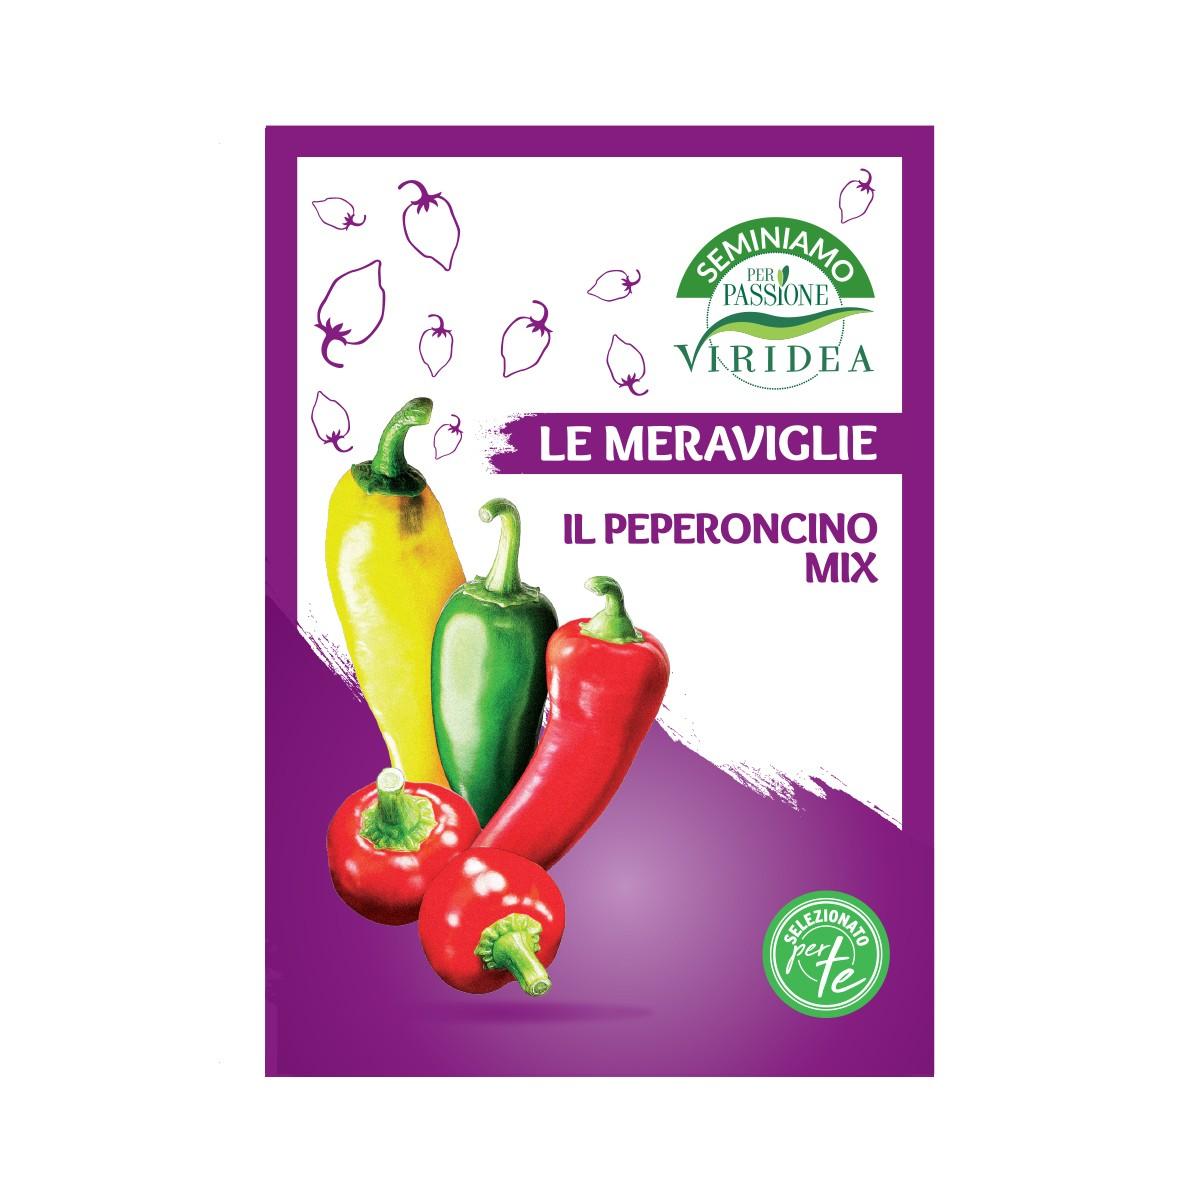 Mix Semi Di Peperoncino Viridea